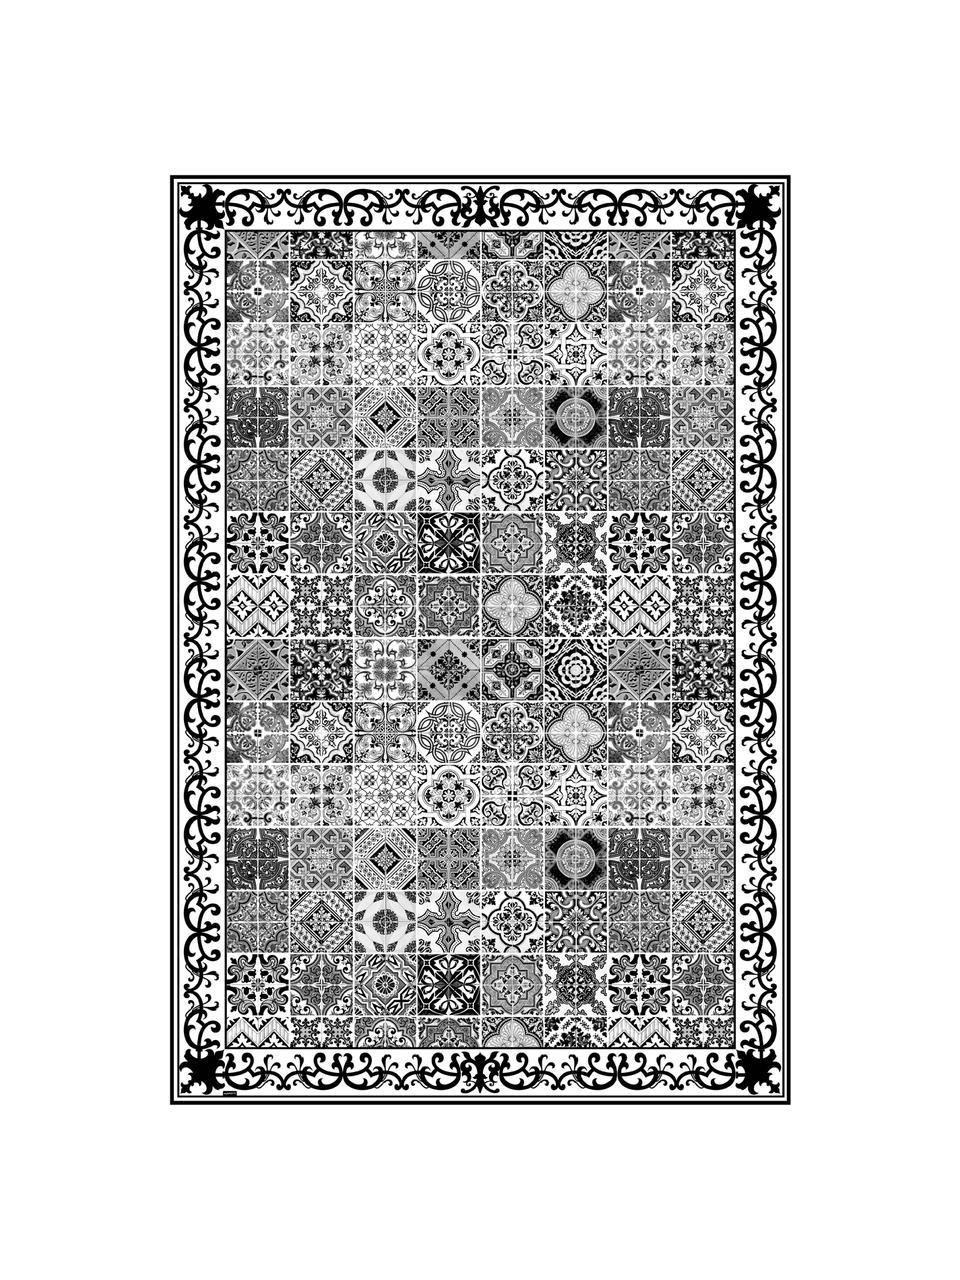 Vlakke vinyl vloermat Olè in zwart en wit, antislip, Recyclebaar vinyl, Zwart, wit, grijs, 136 x 203 cm